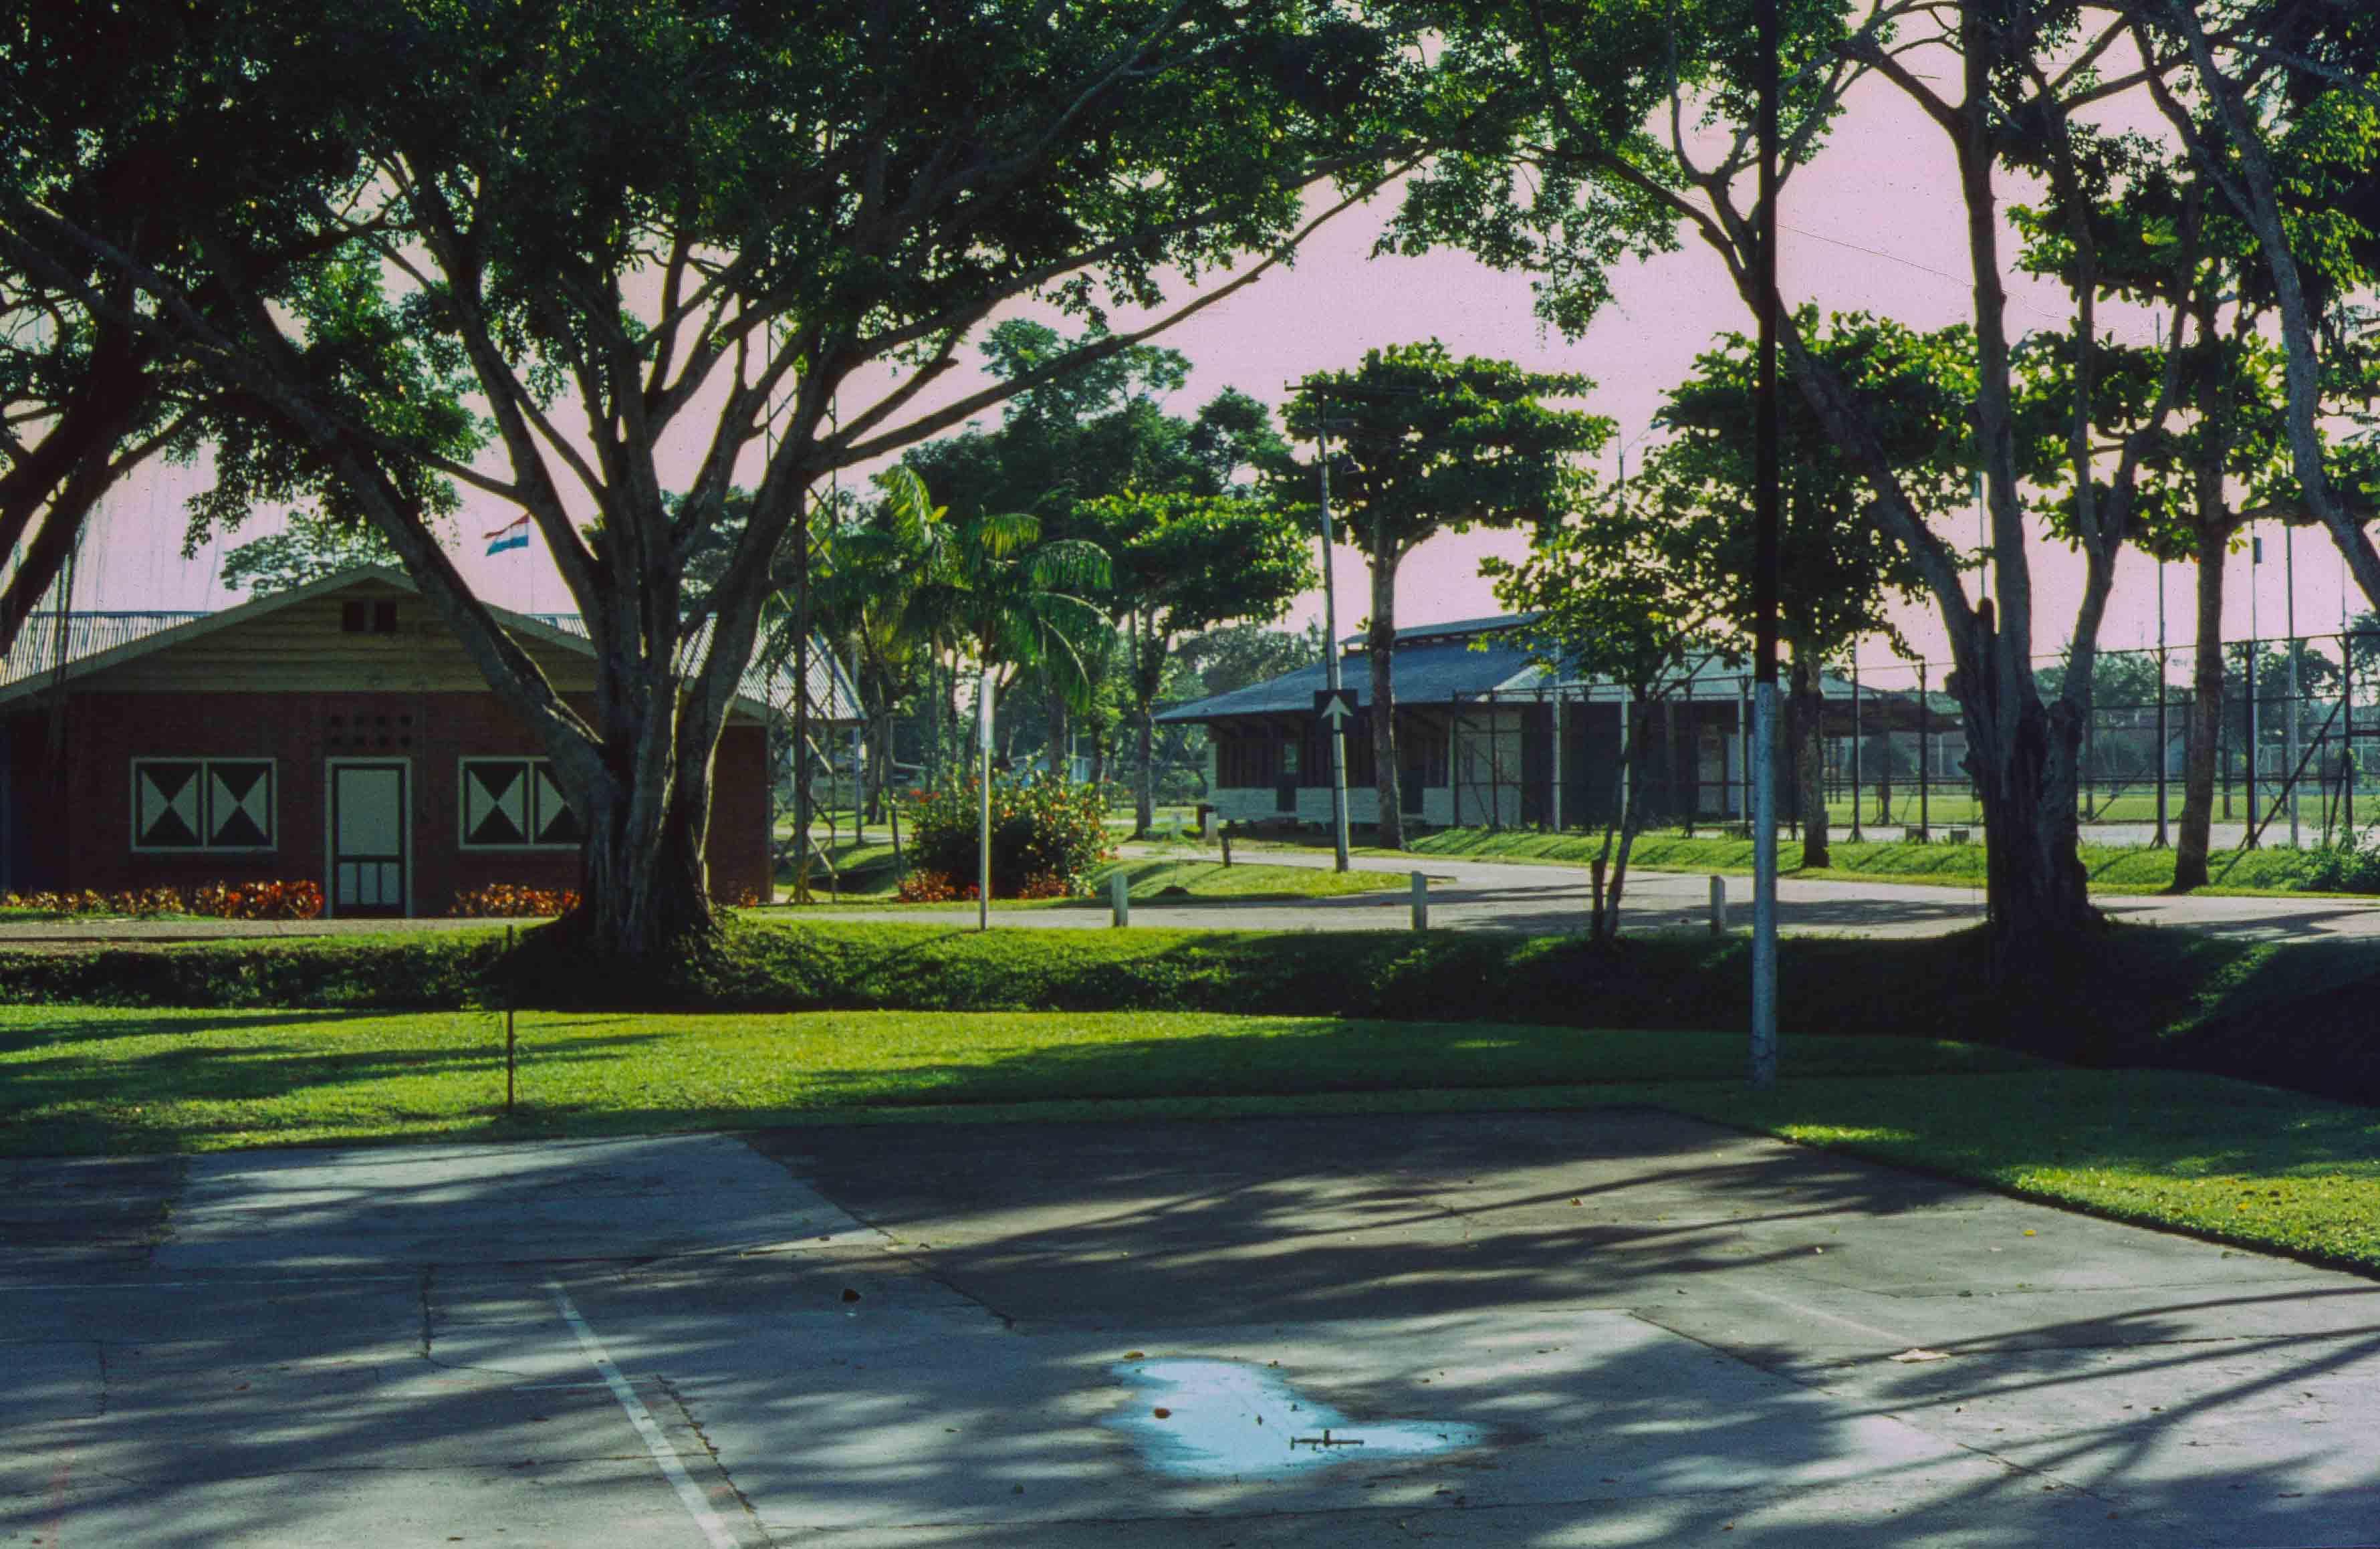 288. Suriname